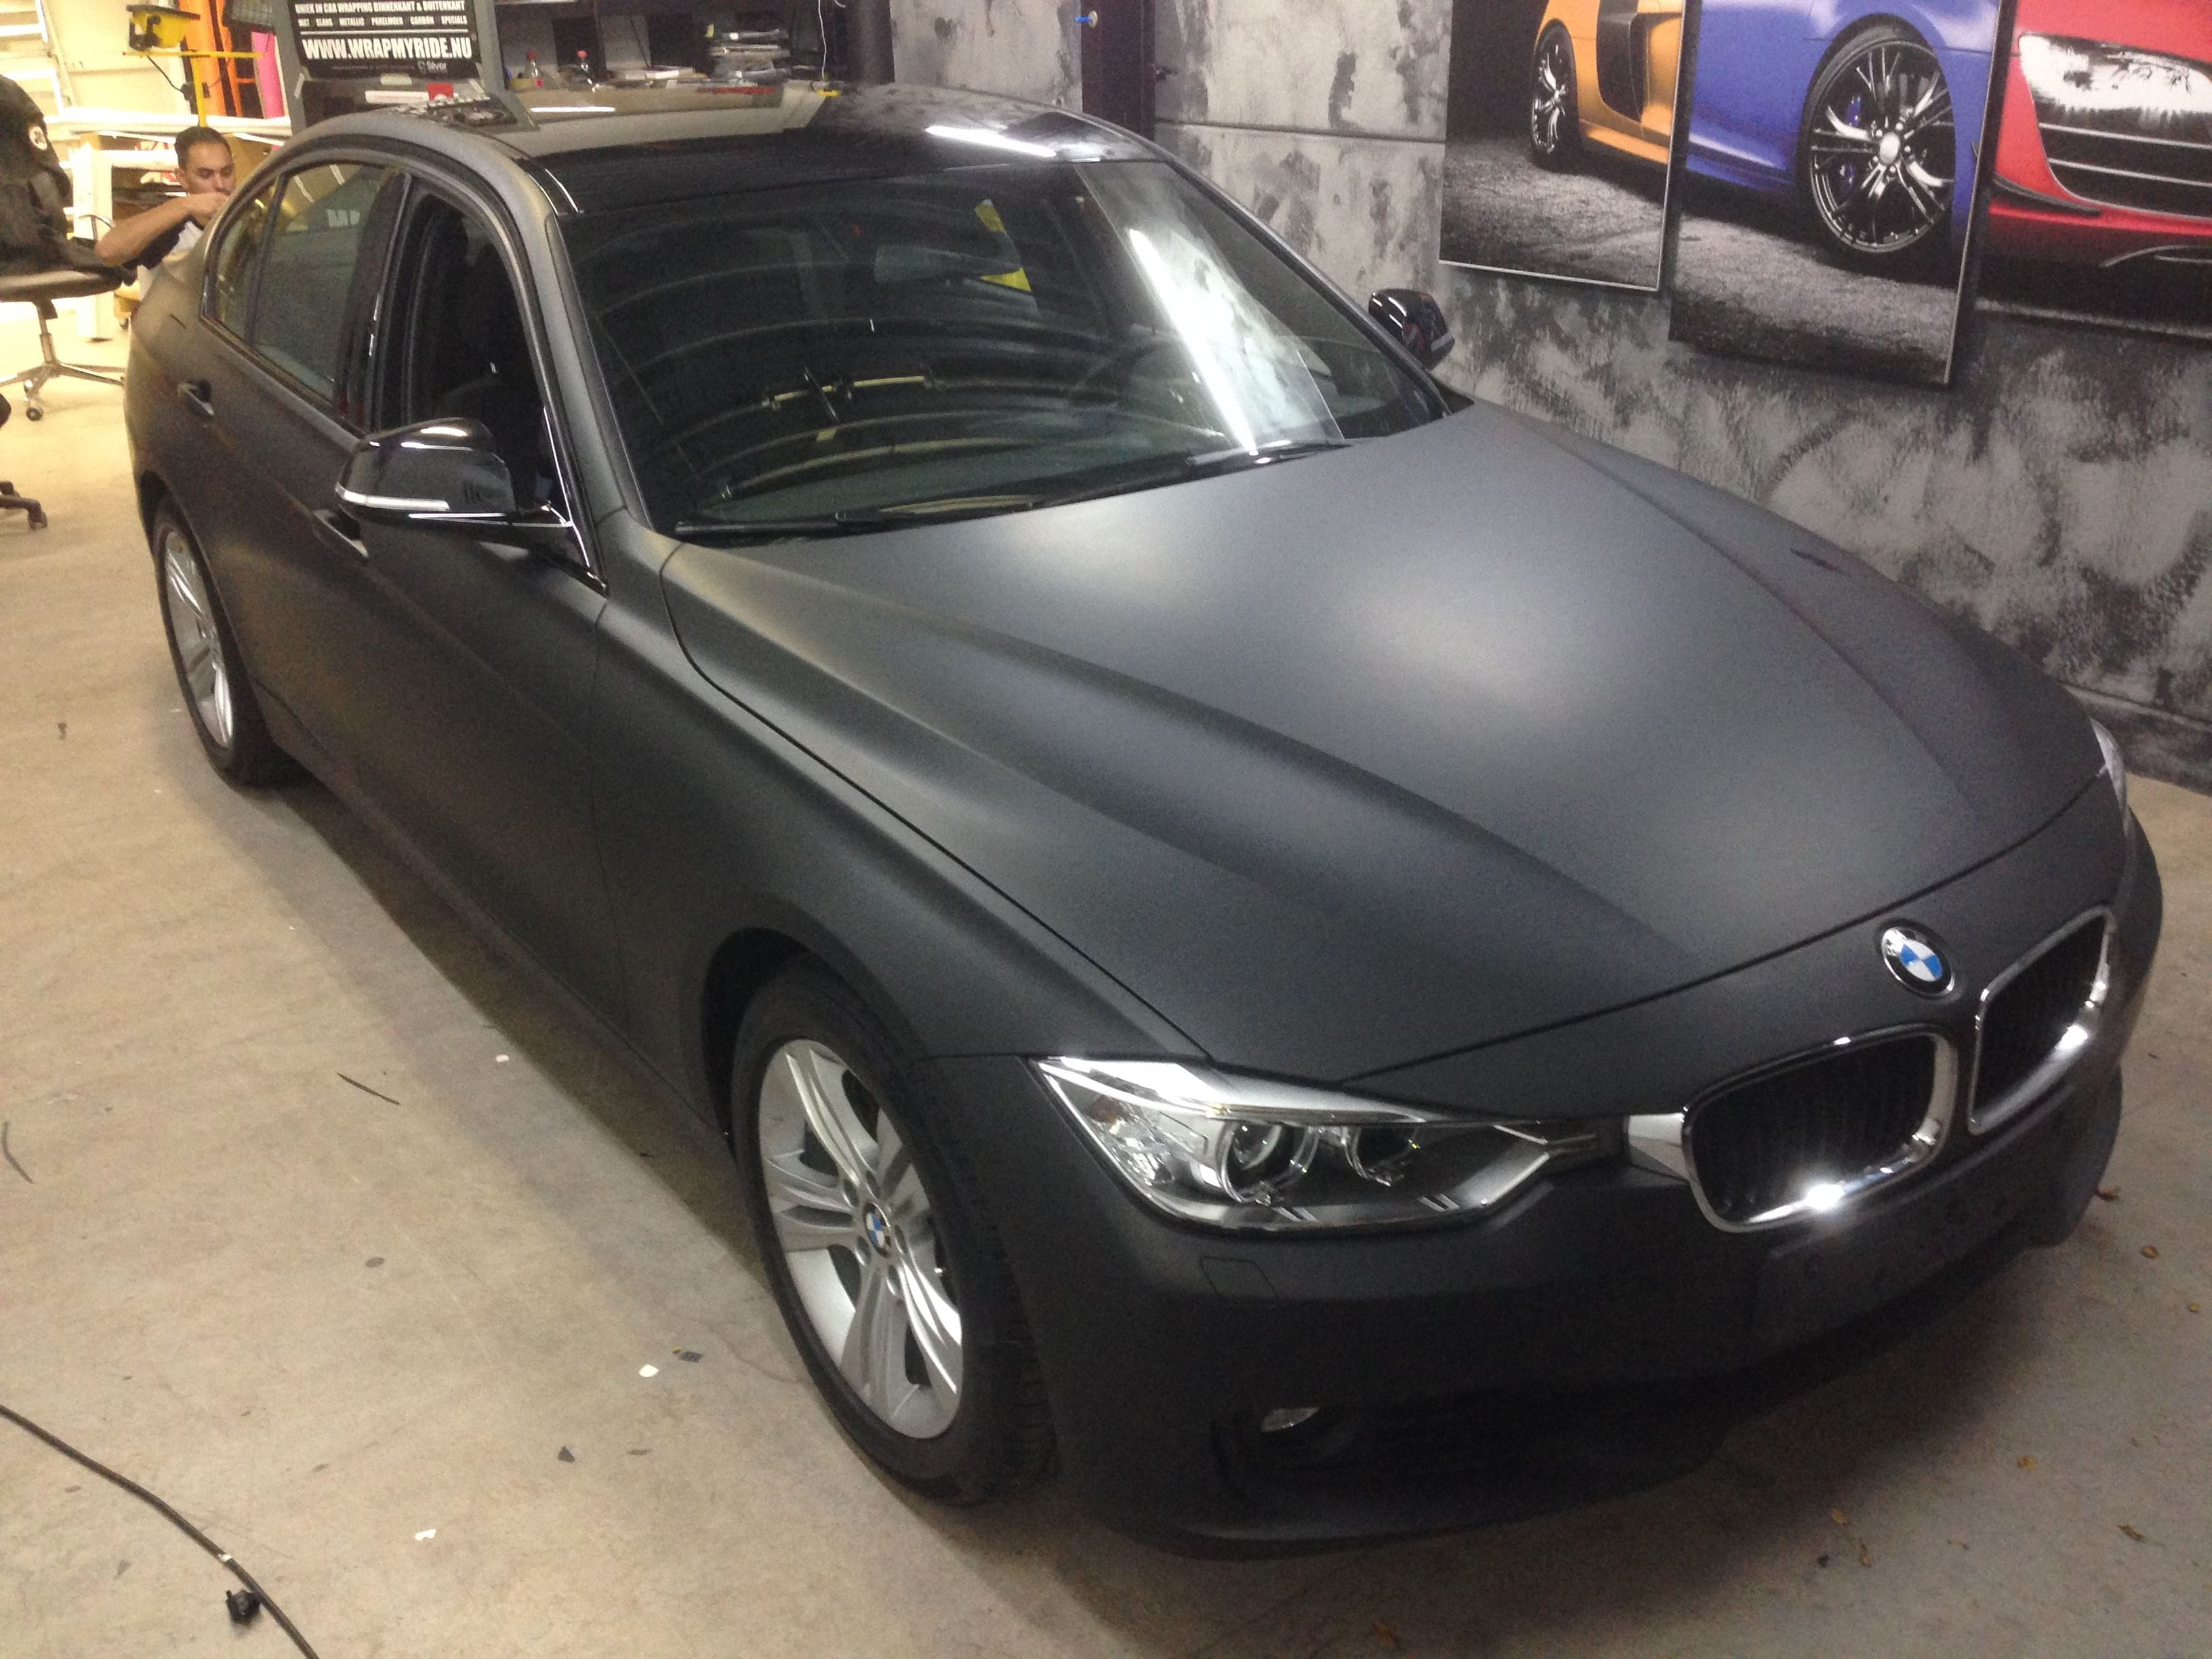 BMW E92 3 Serie met Mat Zwarte Wrap, Carwrapping door Wrapmyride.nu Foto-nr:5415, ©2021